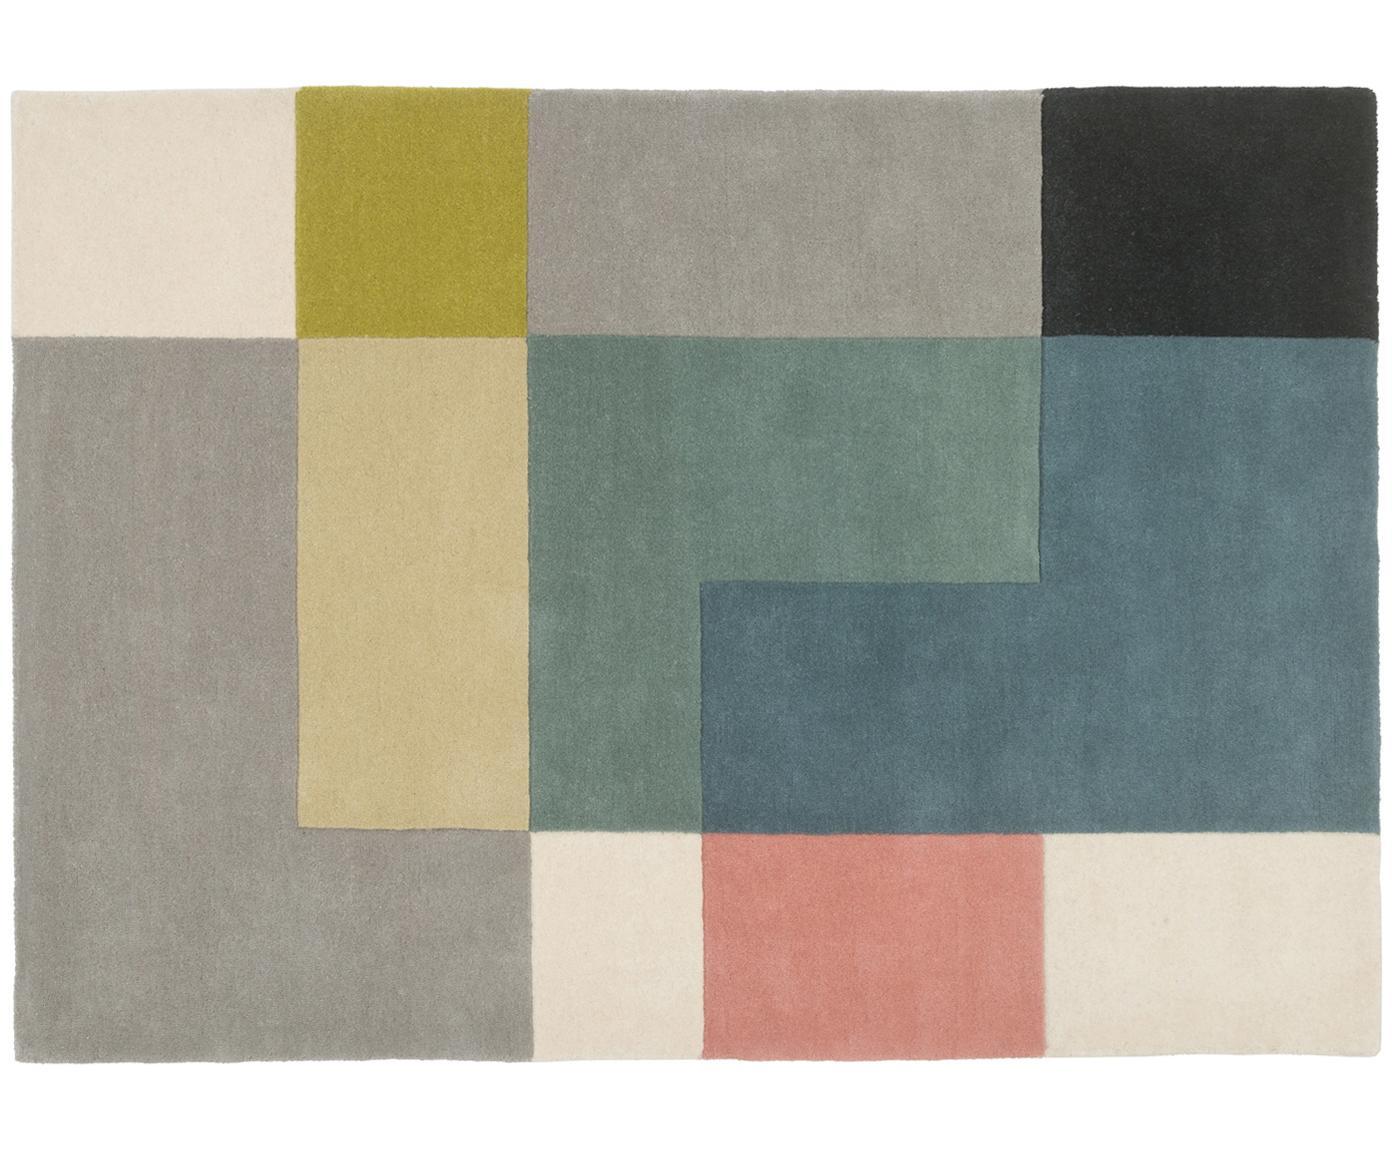 Design vloerkleed Tetris uit wol, handgetuftet, Multicolour, 140 x 200 cm